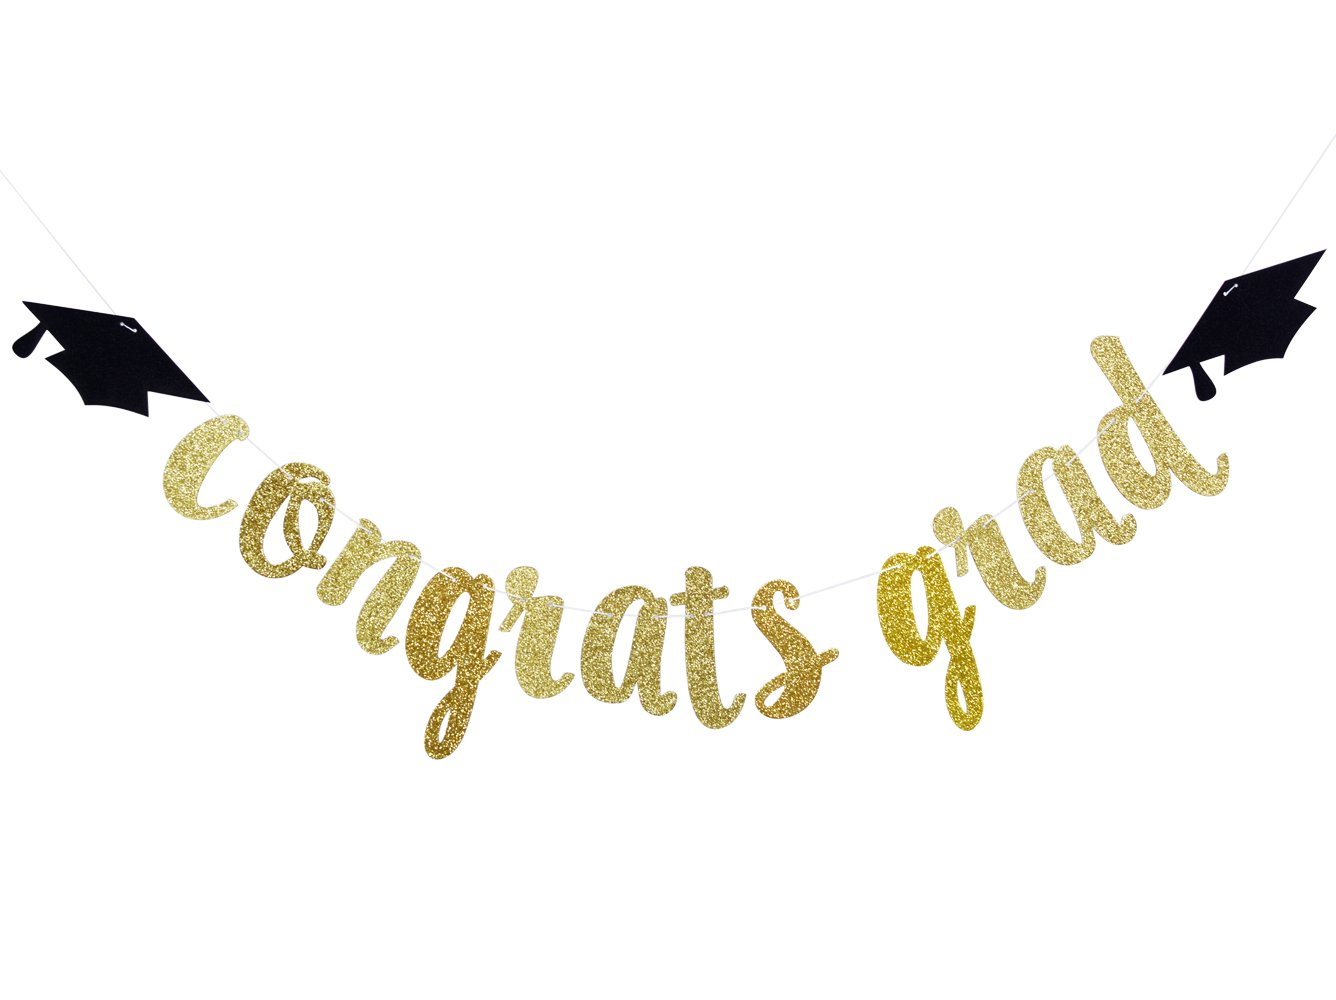 High School College Graduation Party Decorations INNORU Silver Glitter Congrats Grad Banner for Congratulatons Bunting Adventure Begins